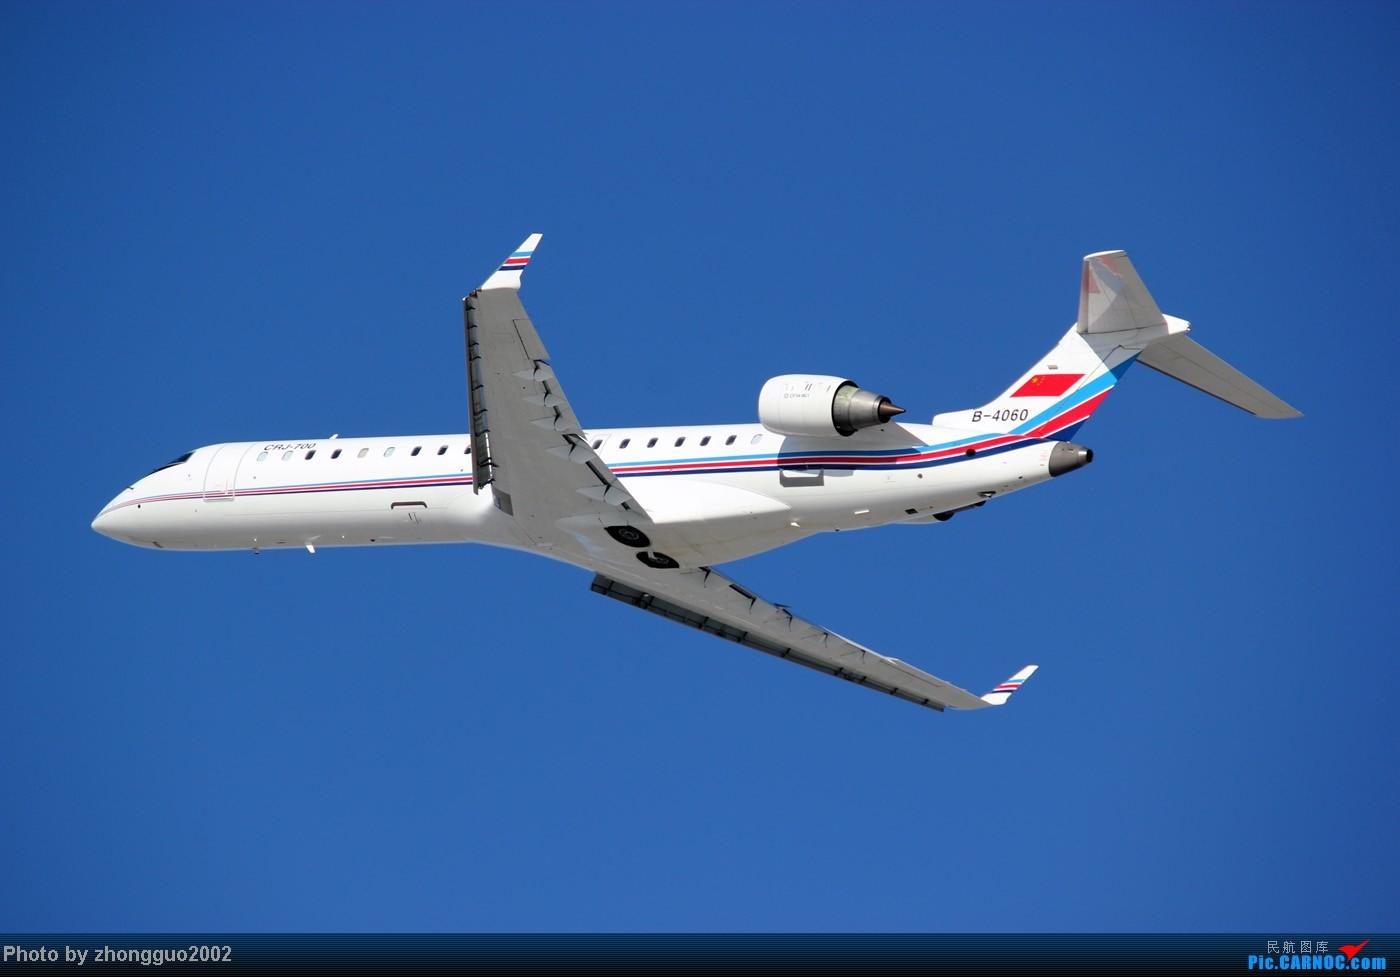 Re:[原创]随着2012年的最后一场雪的到了,我的2012年拍机工作也圆满的结束了,把这段时间里灰机整理一下,把没发的,我个人认为好的发上来! CRJ-700  中国呼和浩特白塔国际机场